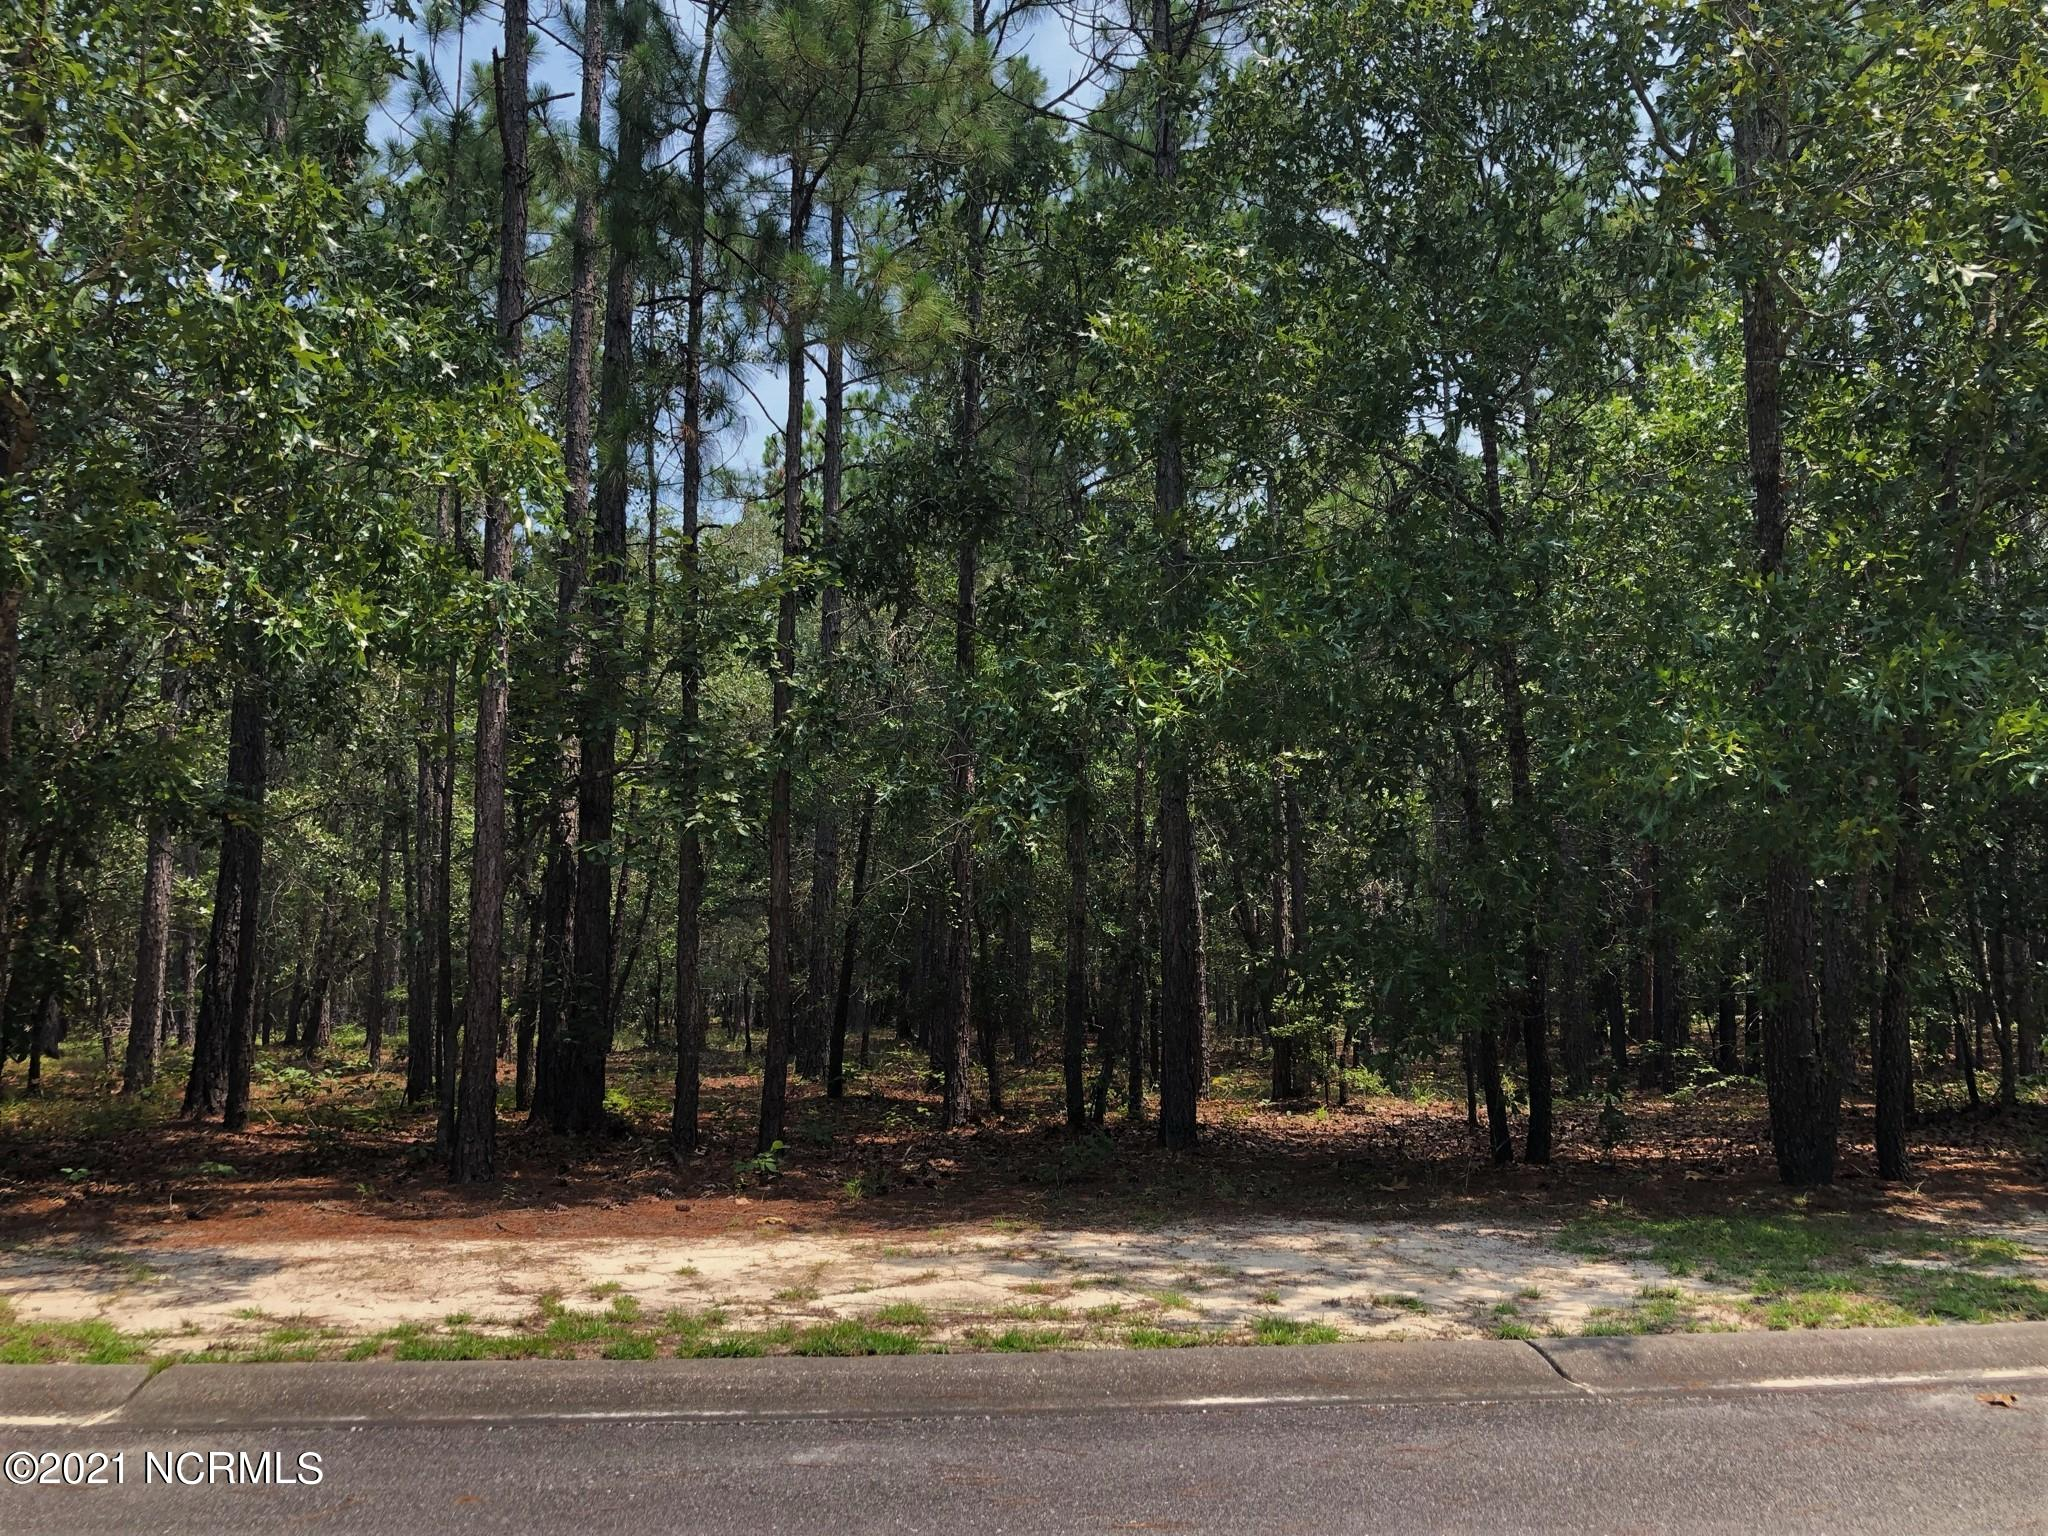 525 Estevao Lane, Bolivia, North Carolina 28422, ,Wooded,For sale,Estevao,100287675